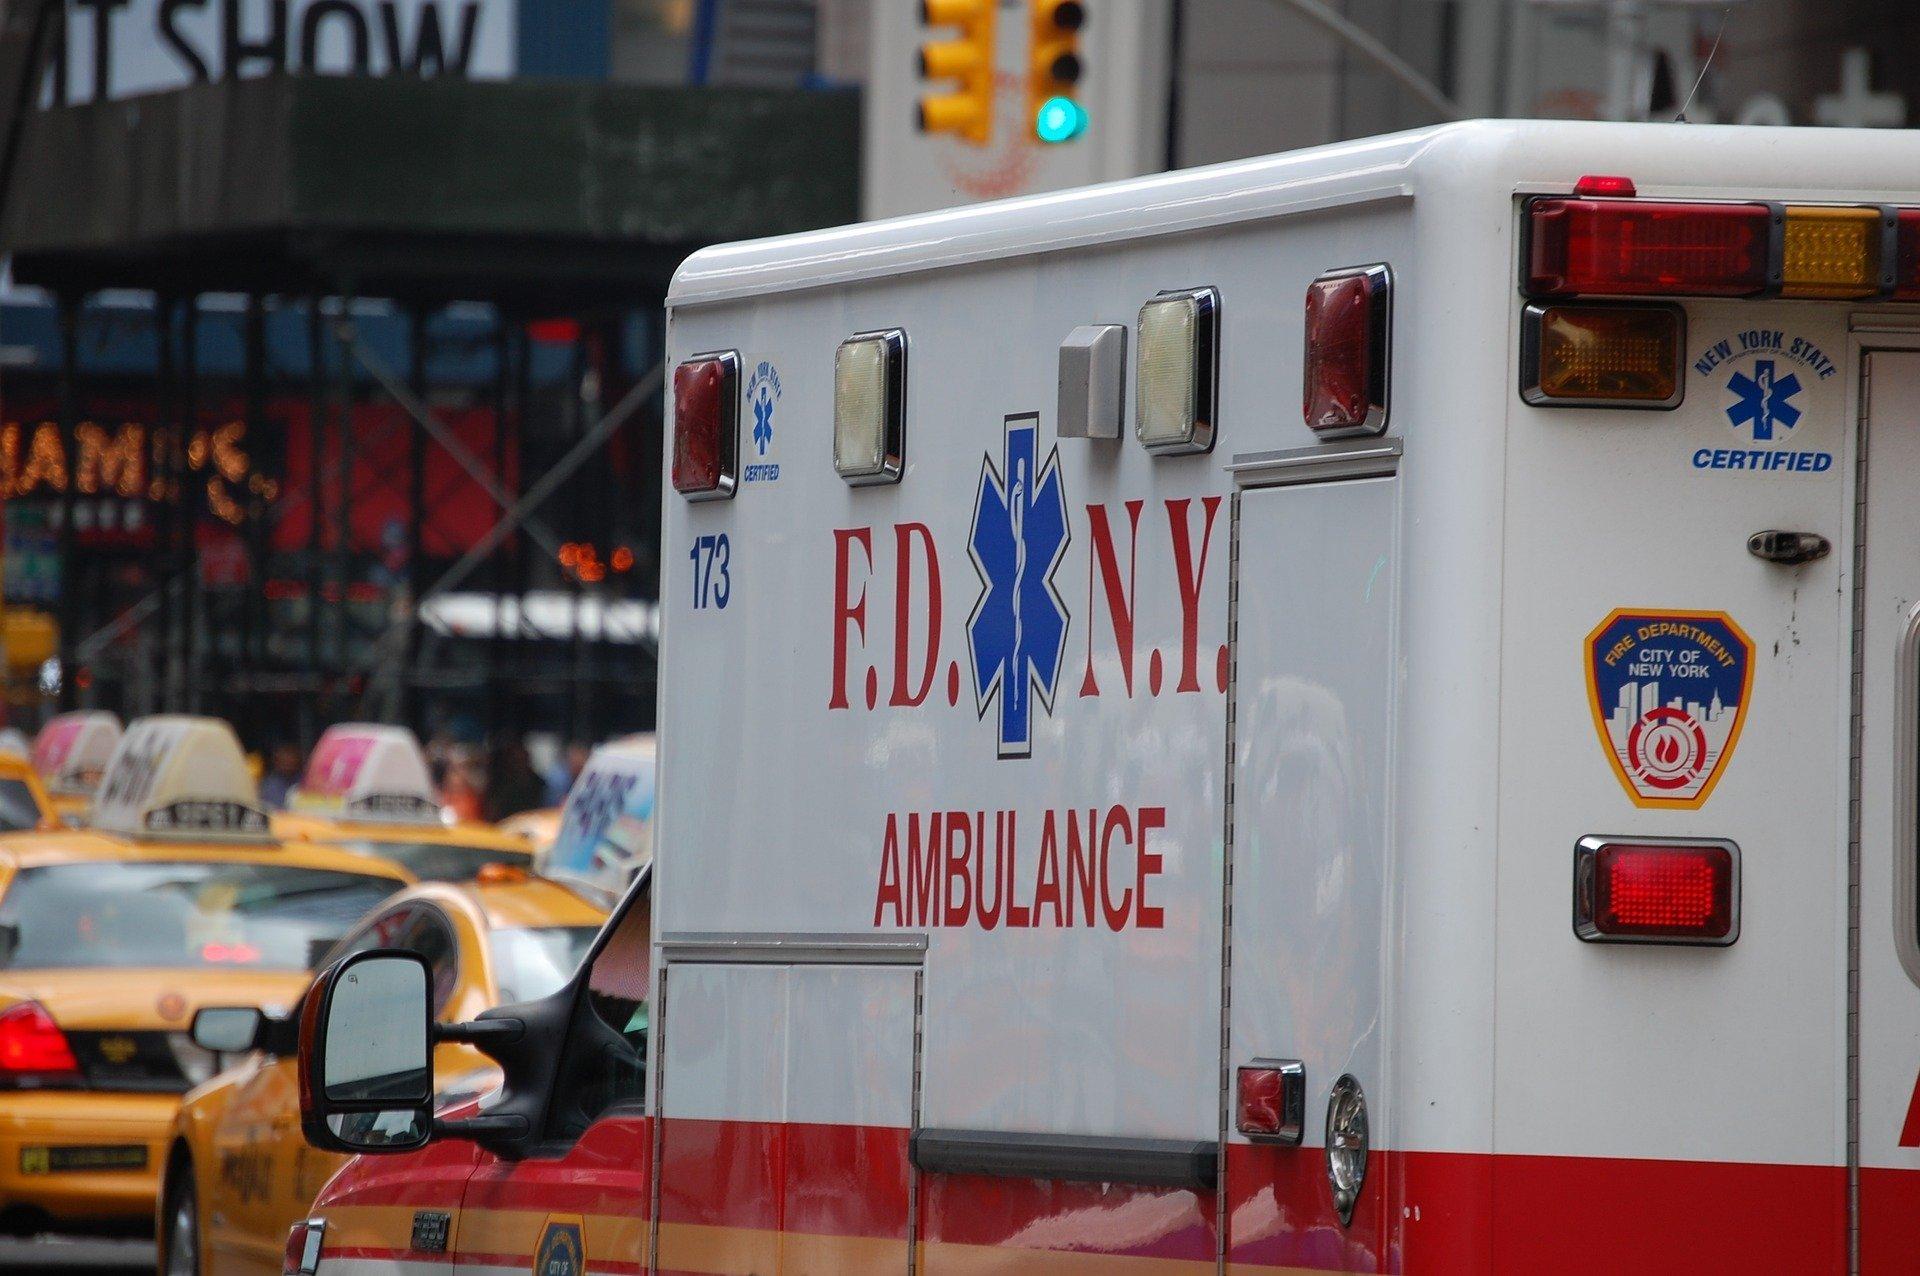 Ambulance dans la circulation. | Source : Pixabay